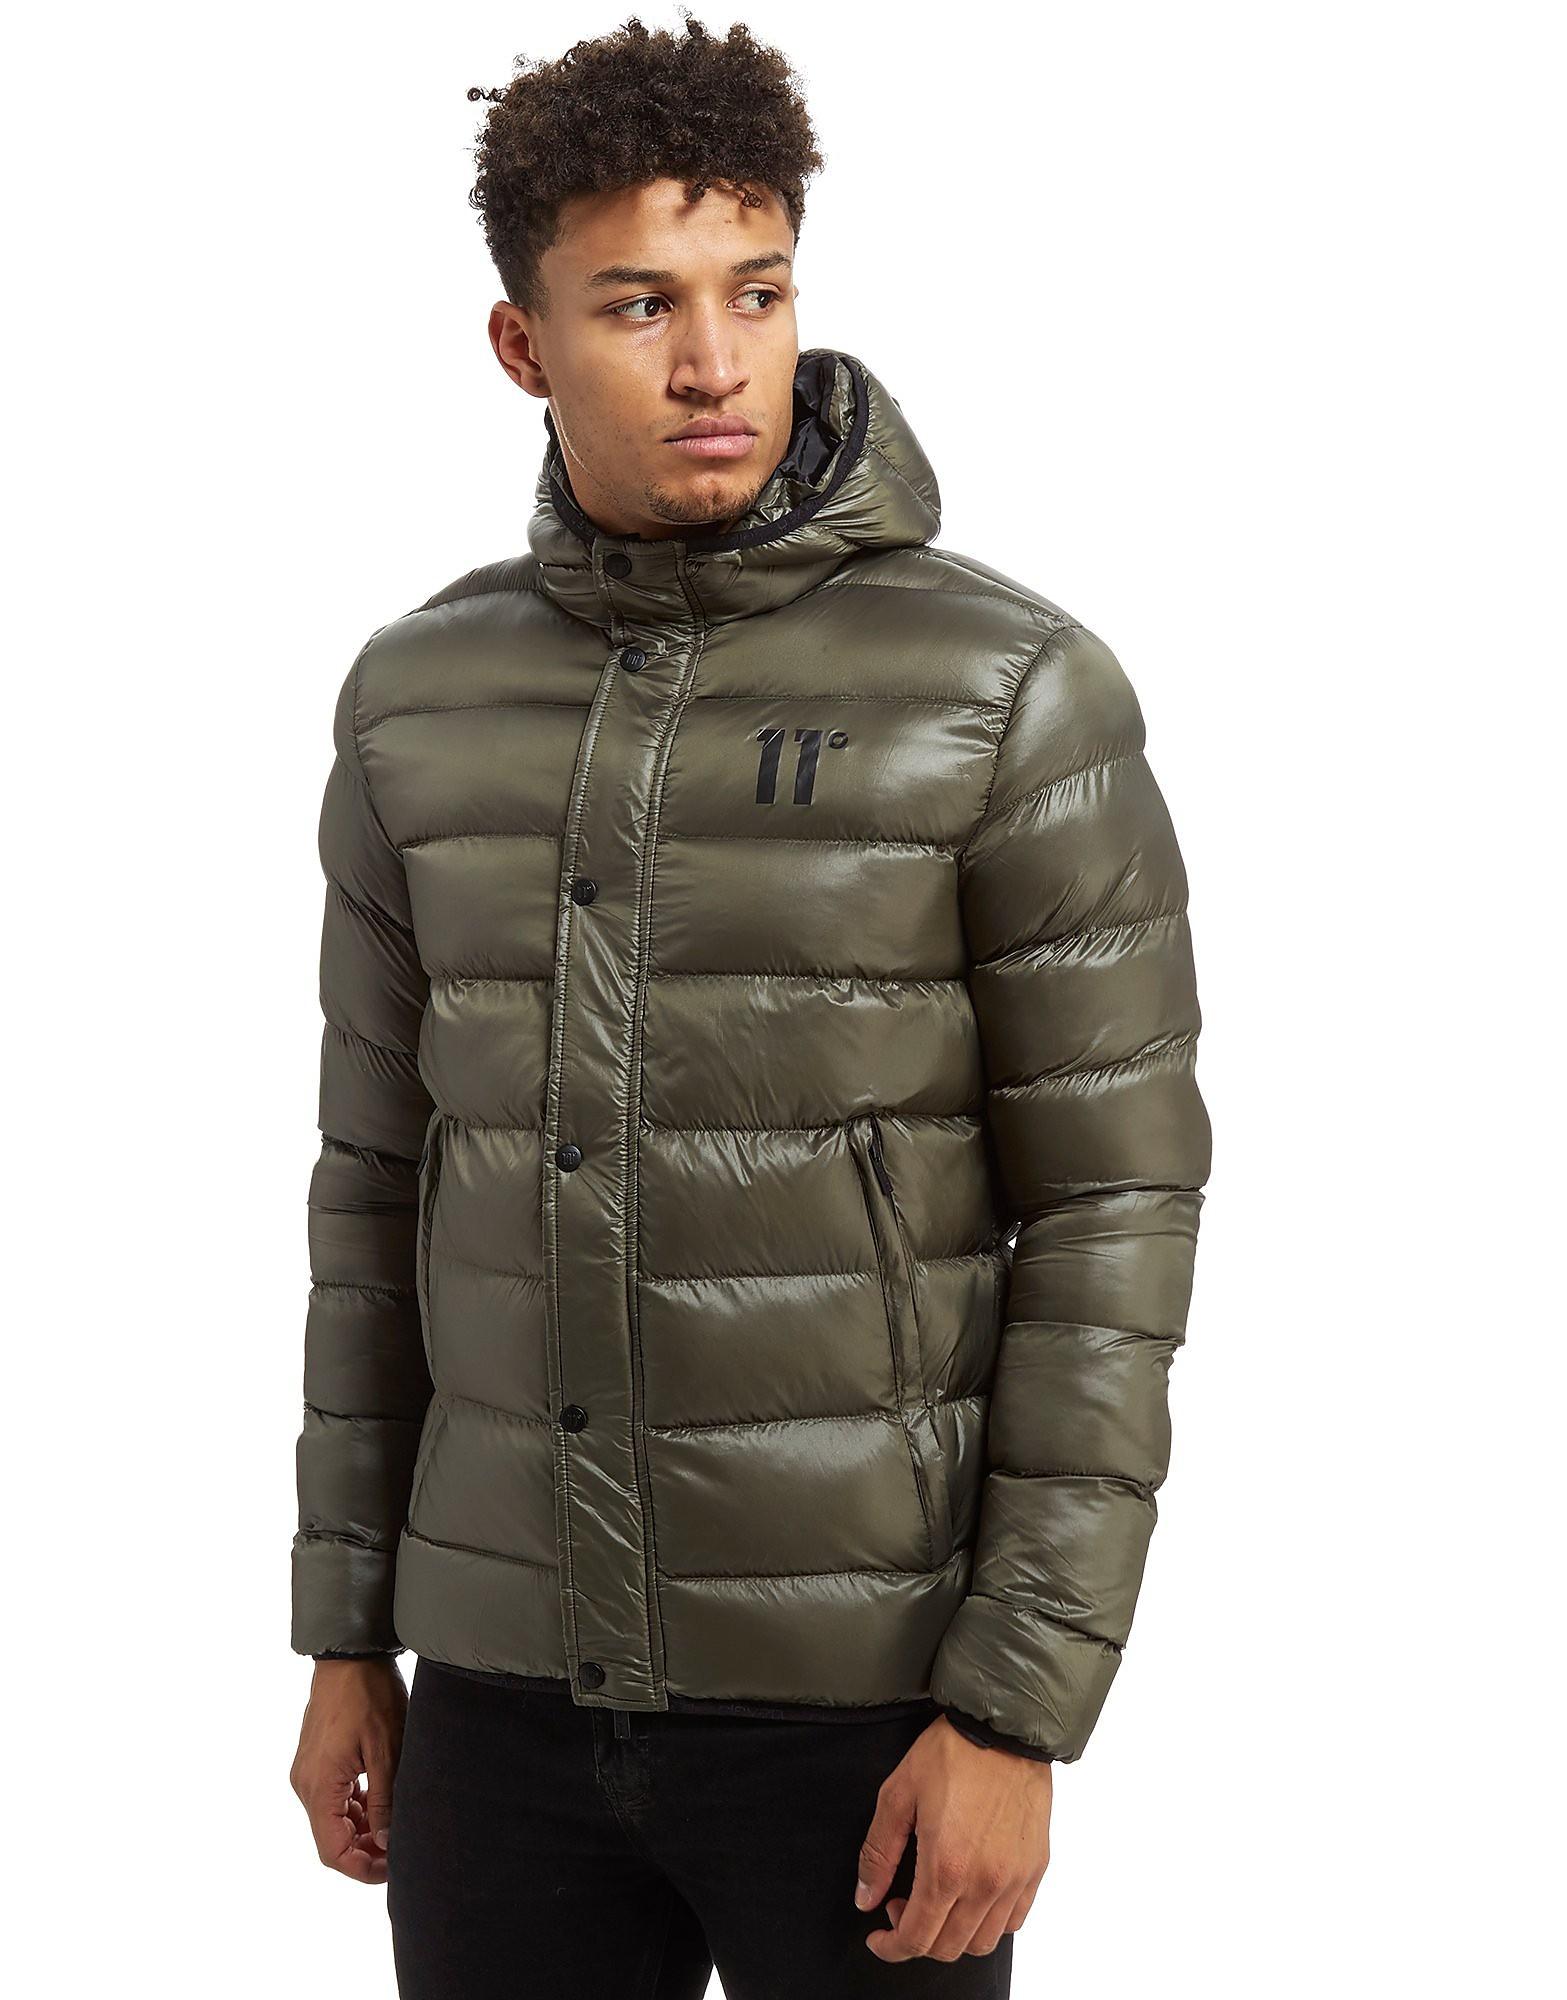 11 Degrees Strike Padded Jacket